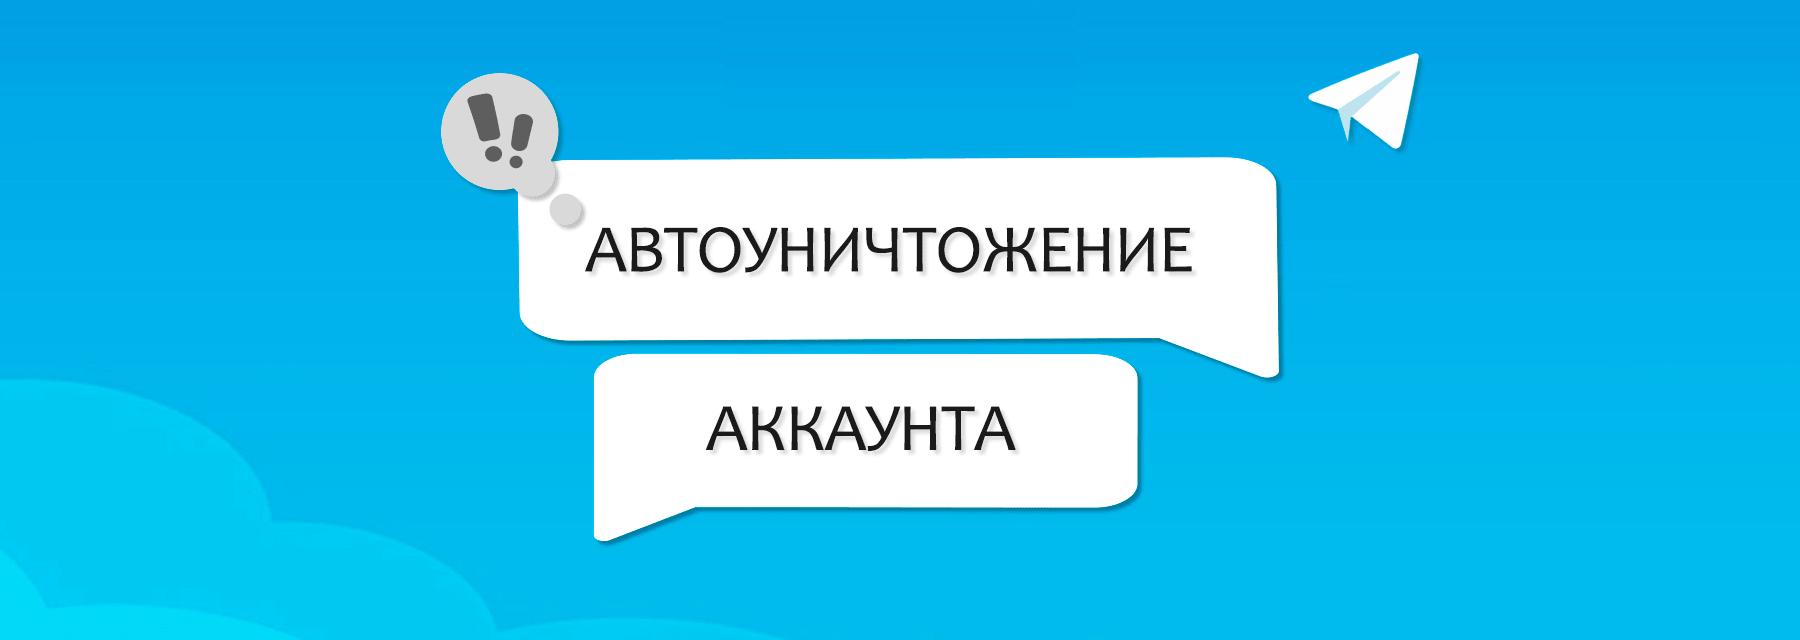 картинка: самоуничтожение аккаунта telegram